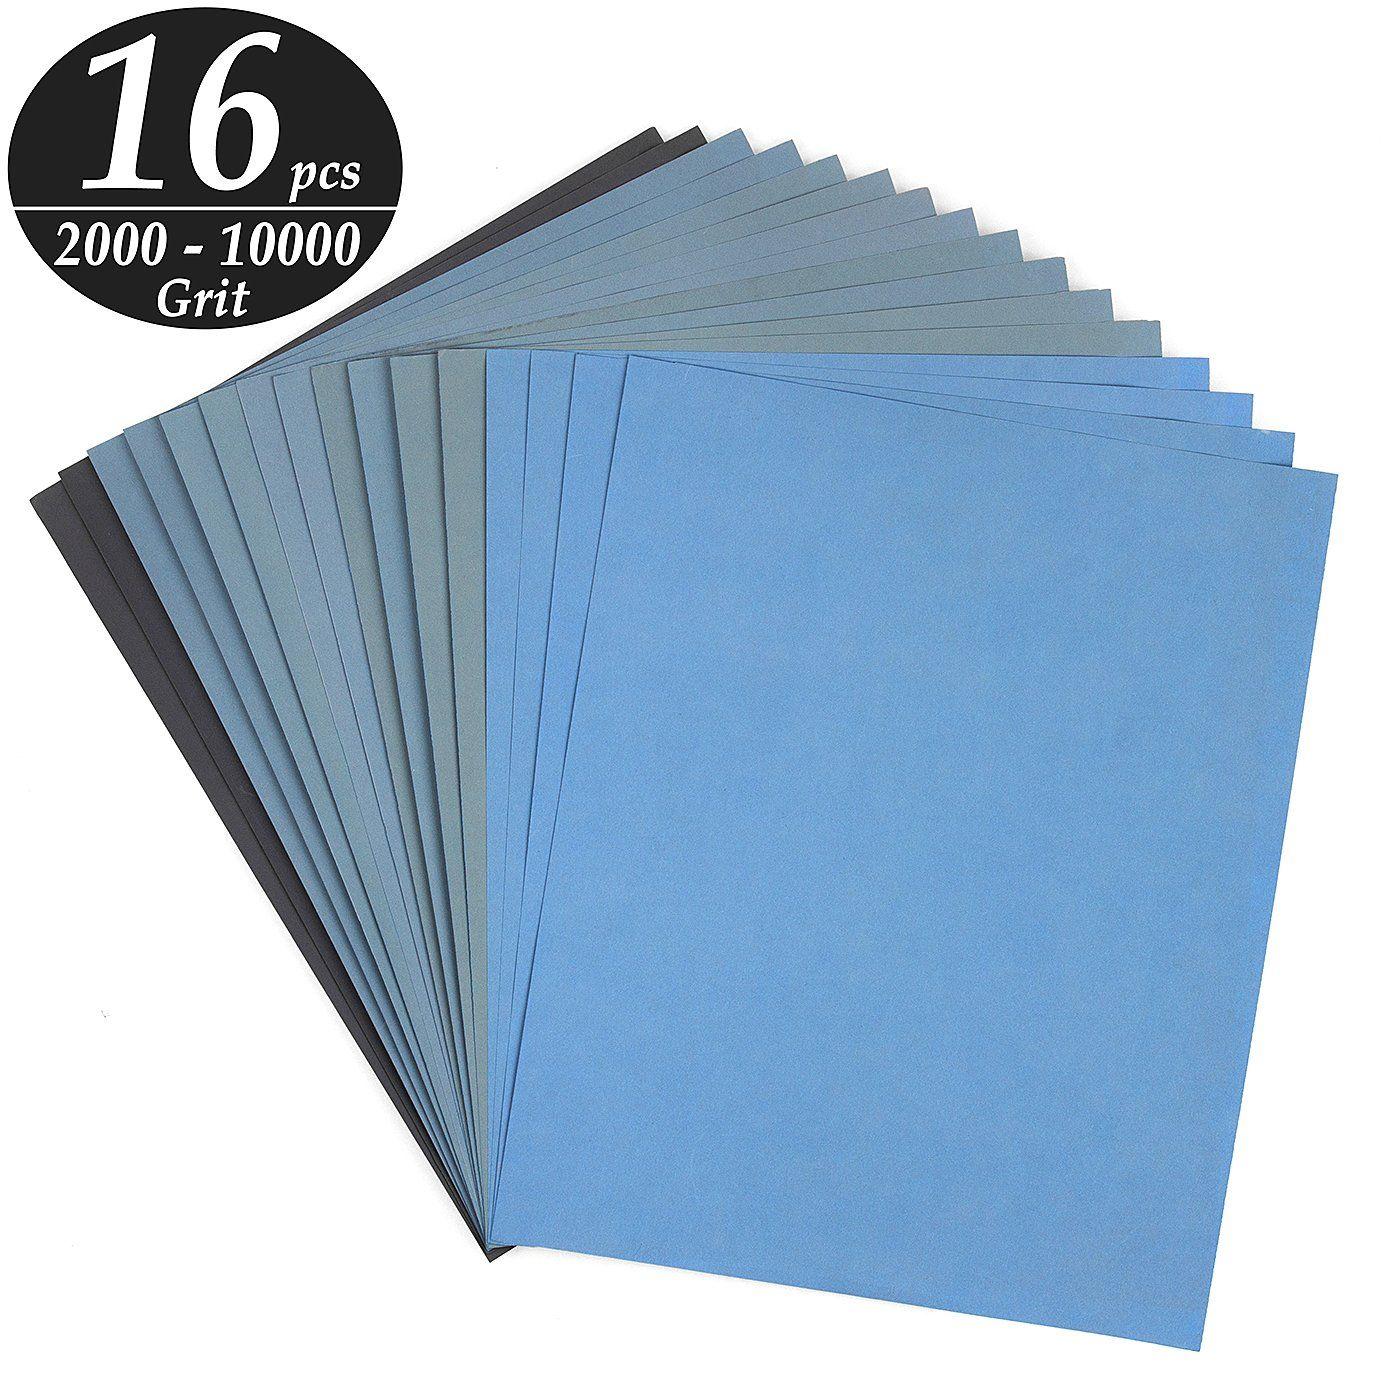 Advcer 9x11 Inch 16 Sheets Sandpaper Wet Or Dry 200010000 Grit 8 Assortment Sand Paper Super Fine Abrasi Metal Furniture Furniture Design Sketches Sanding Wood